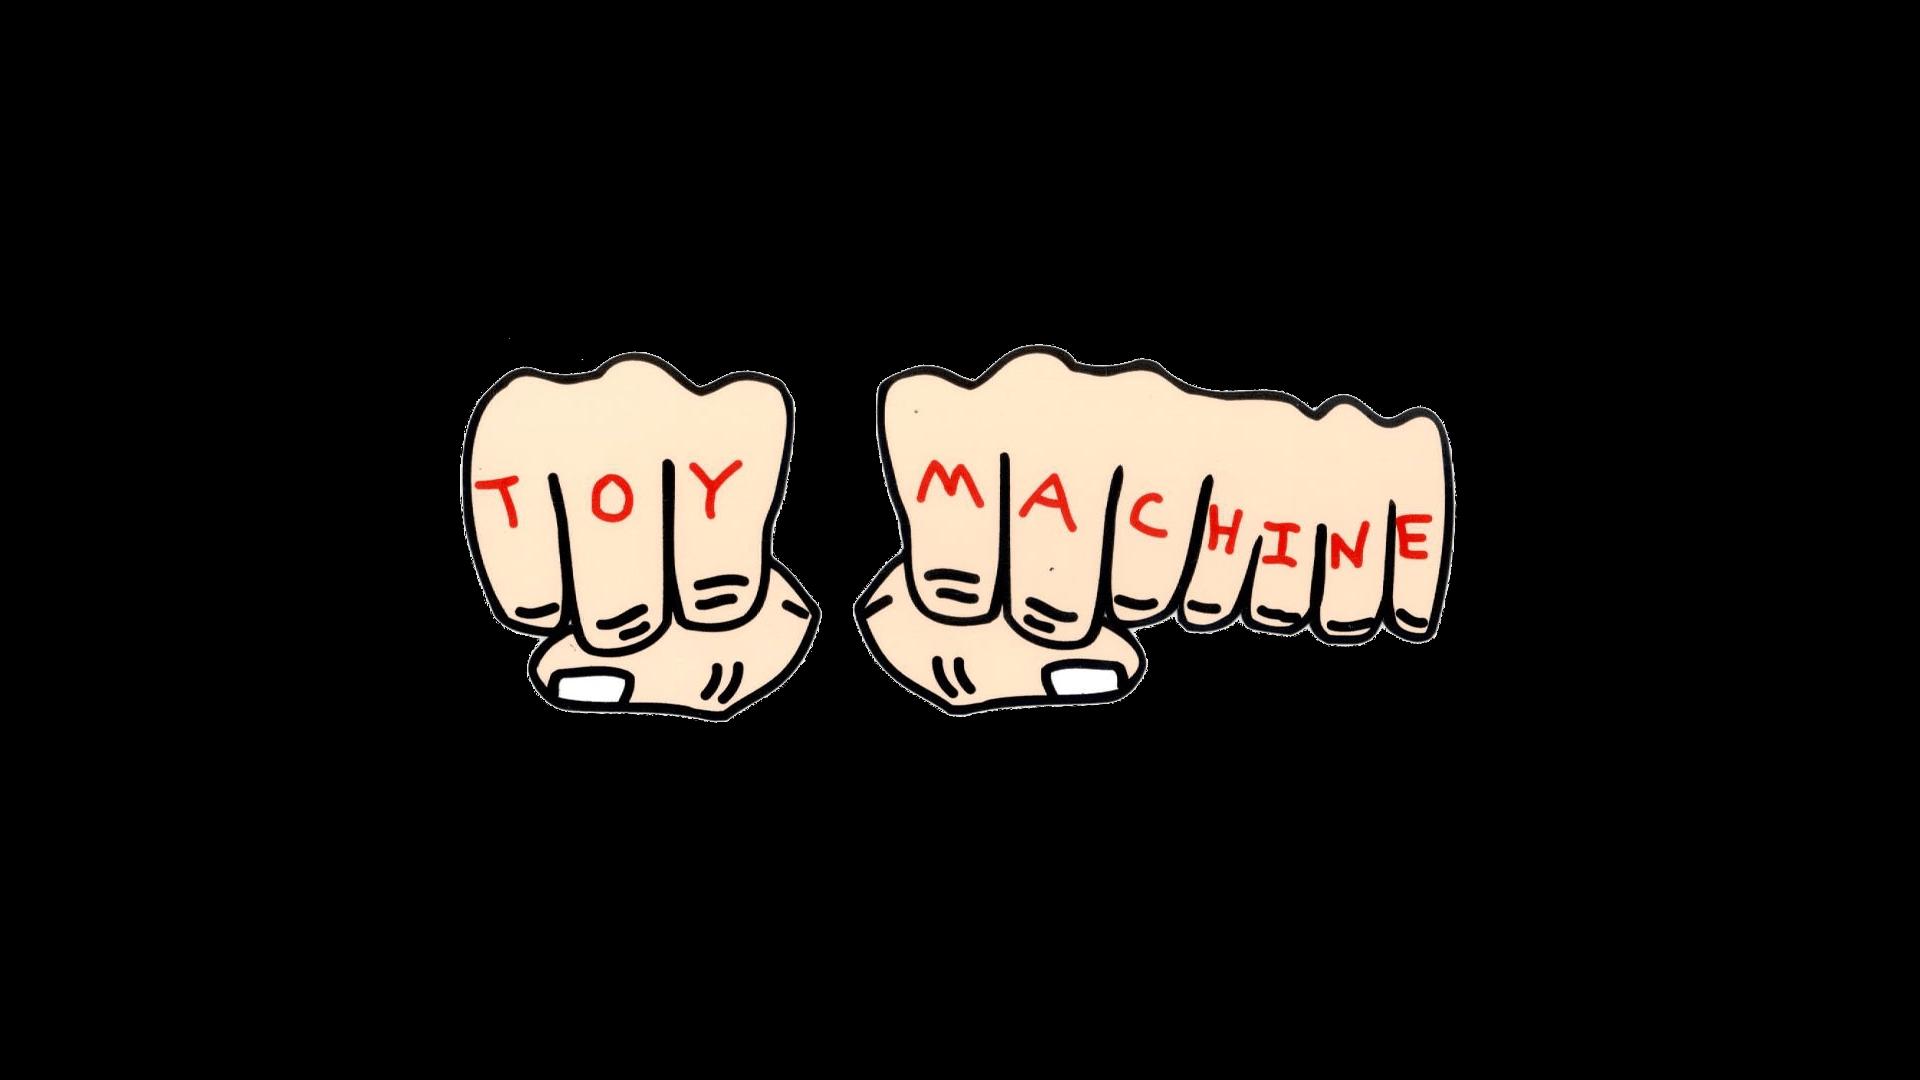 Toy Machine Minimal Dump 2560x1440 1920x1080 Need #iPhone #6S ...